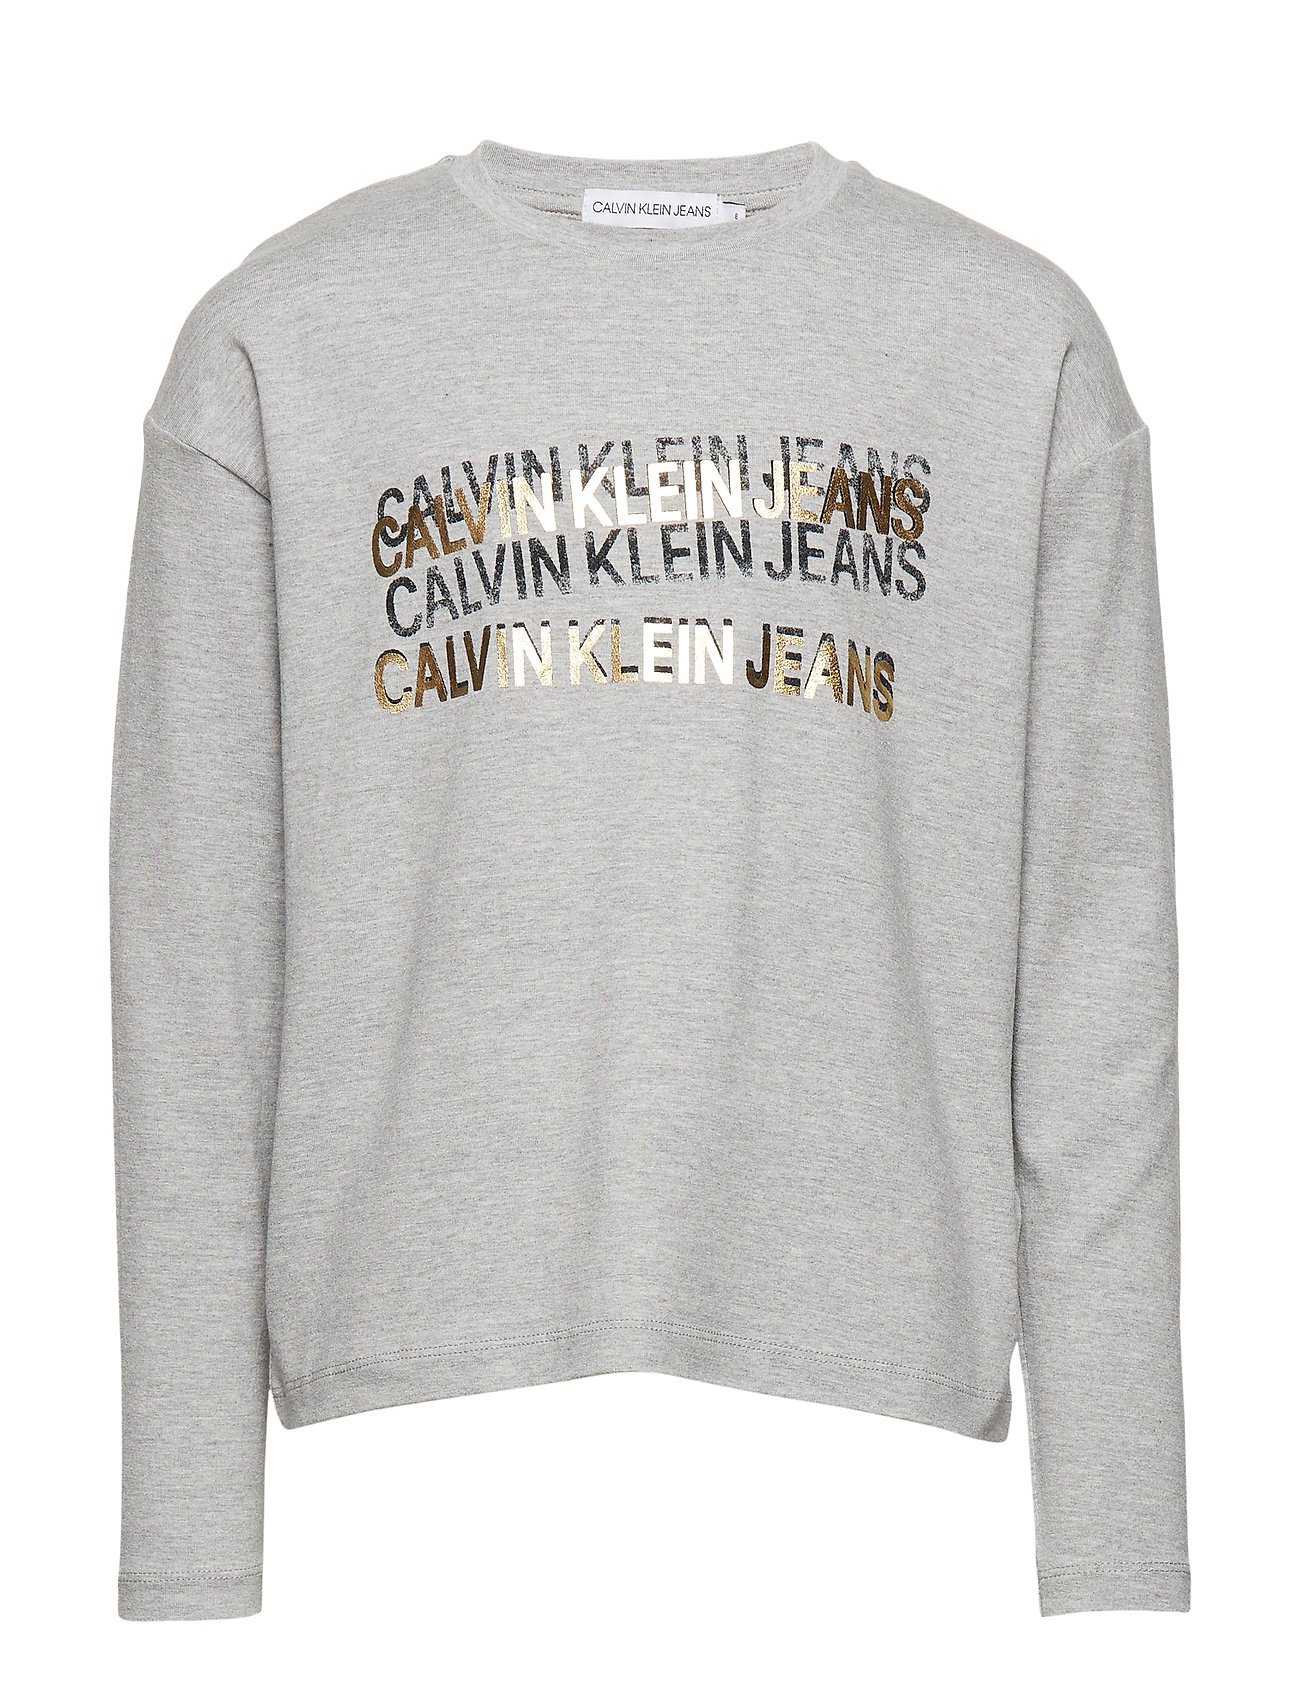 Image of Foil Triple Logo Ls T-Shirt Langærmet T-shirt Grå Calvin Klein (3217406169)